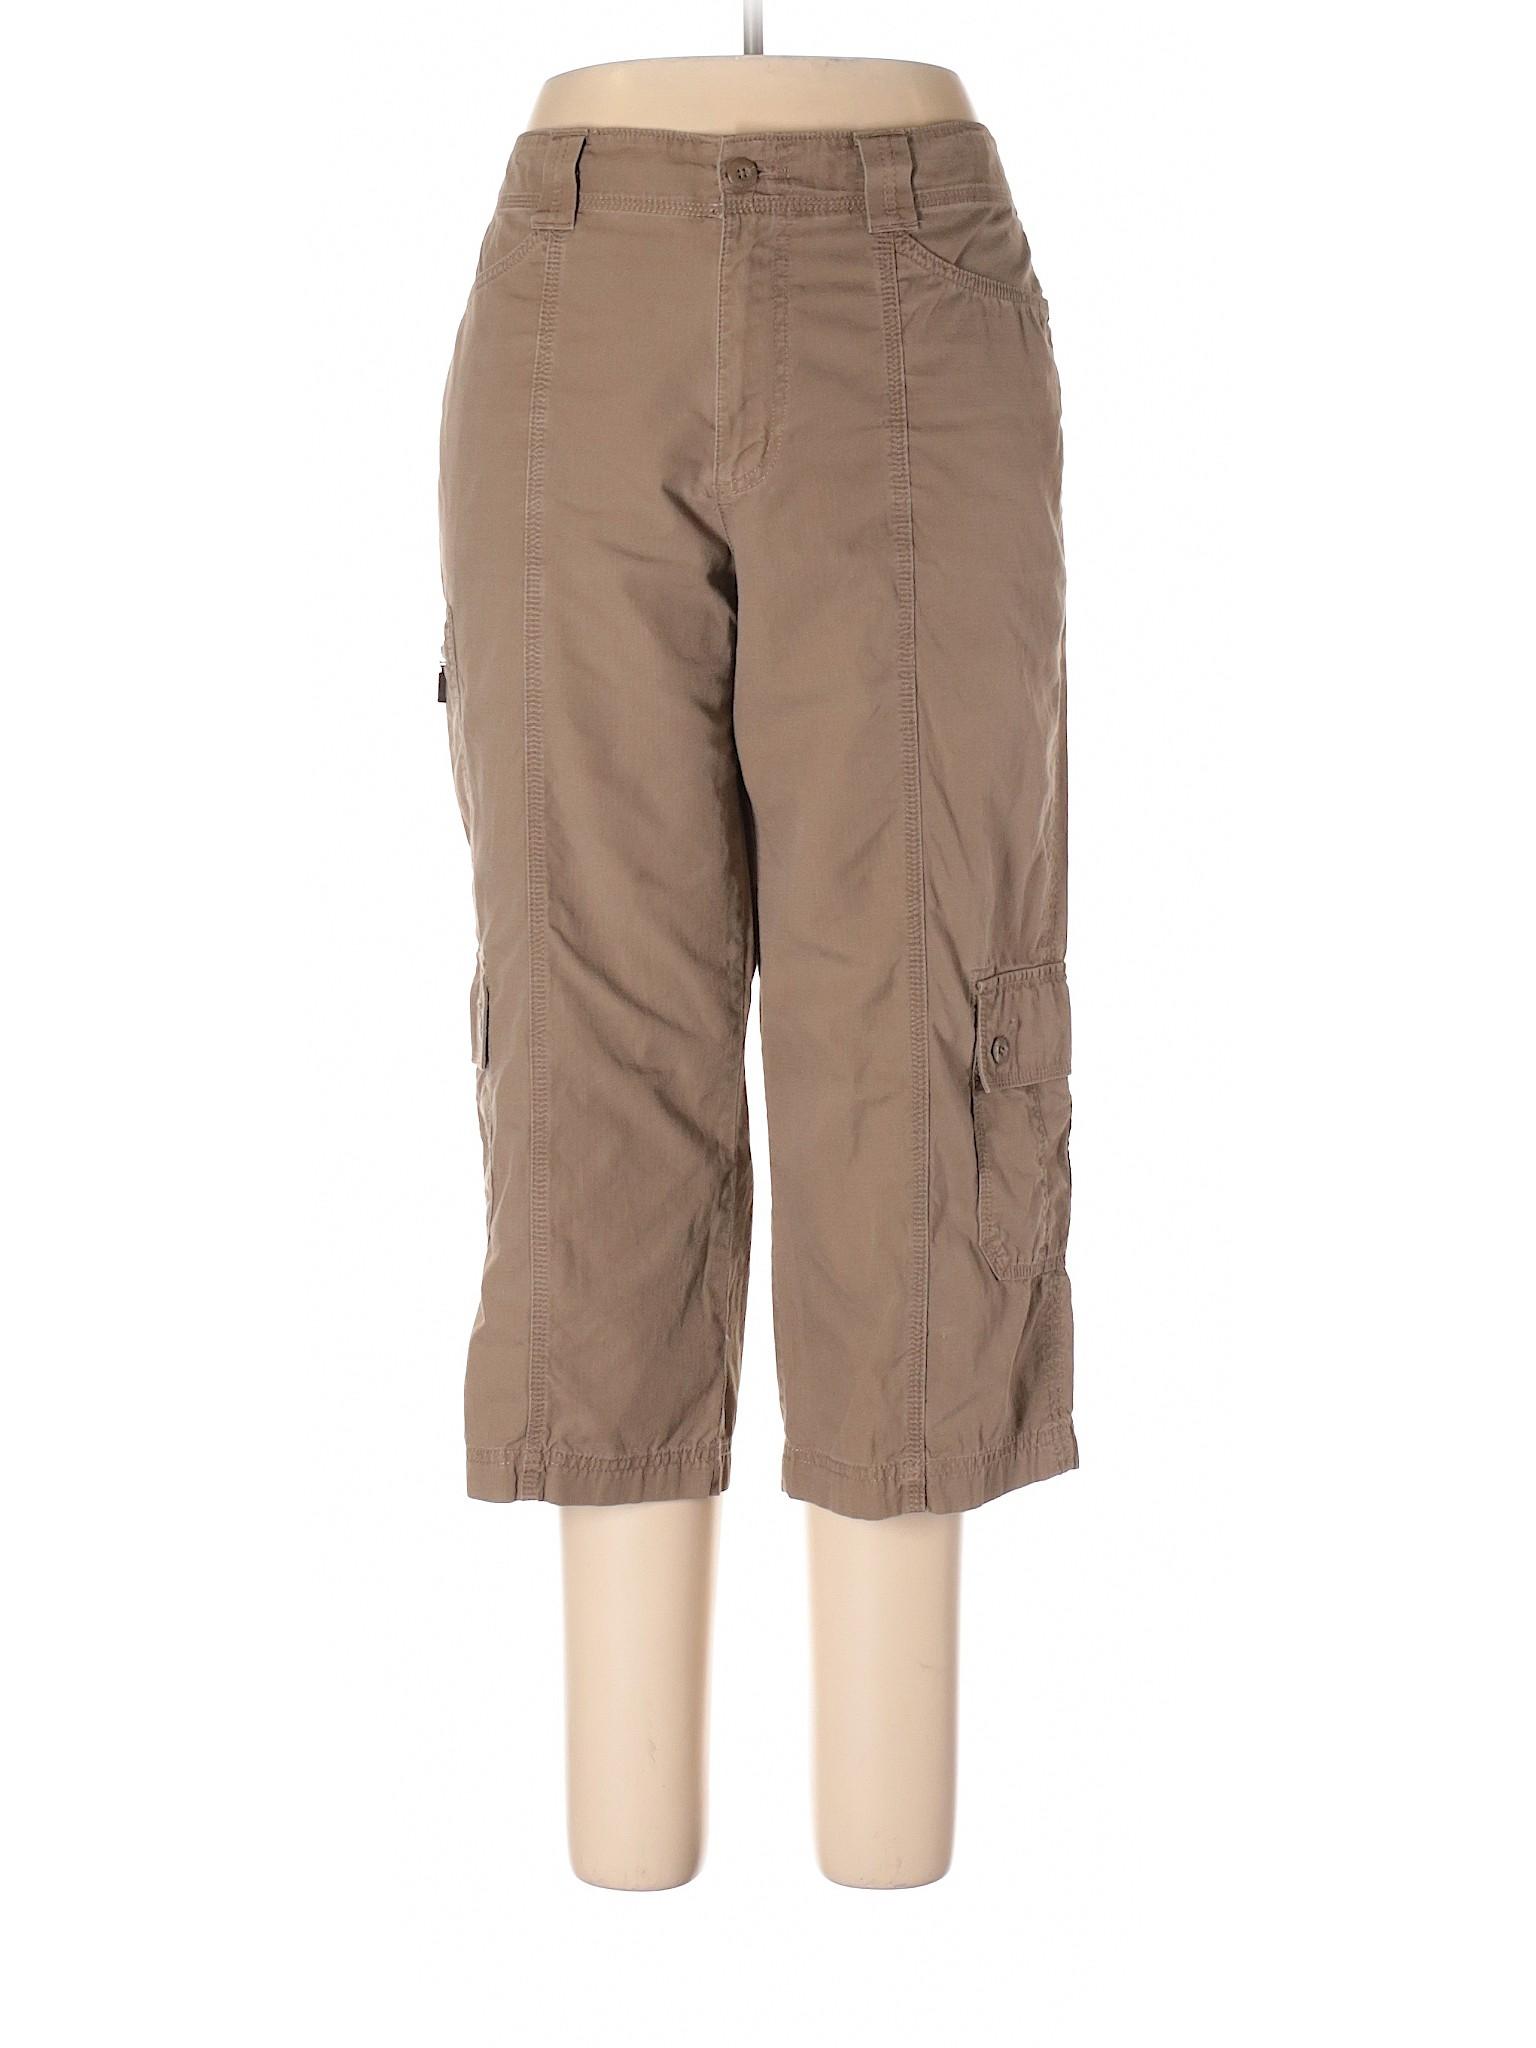 Bauer Pants Cargo leisure Boutique Eddie w1qSxE